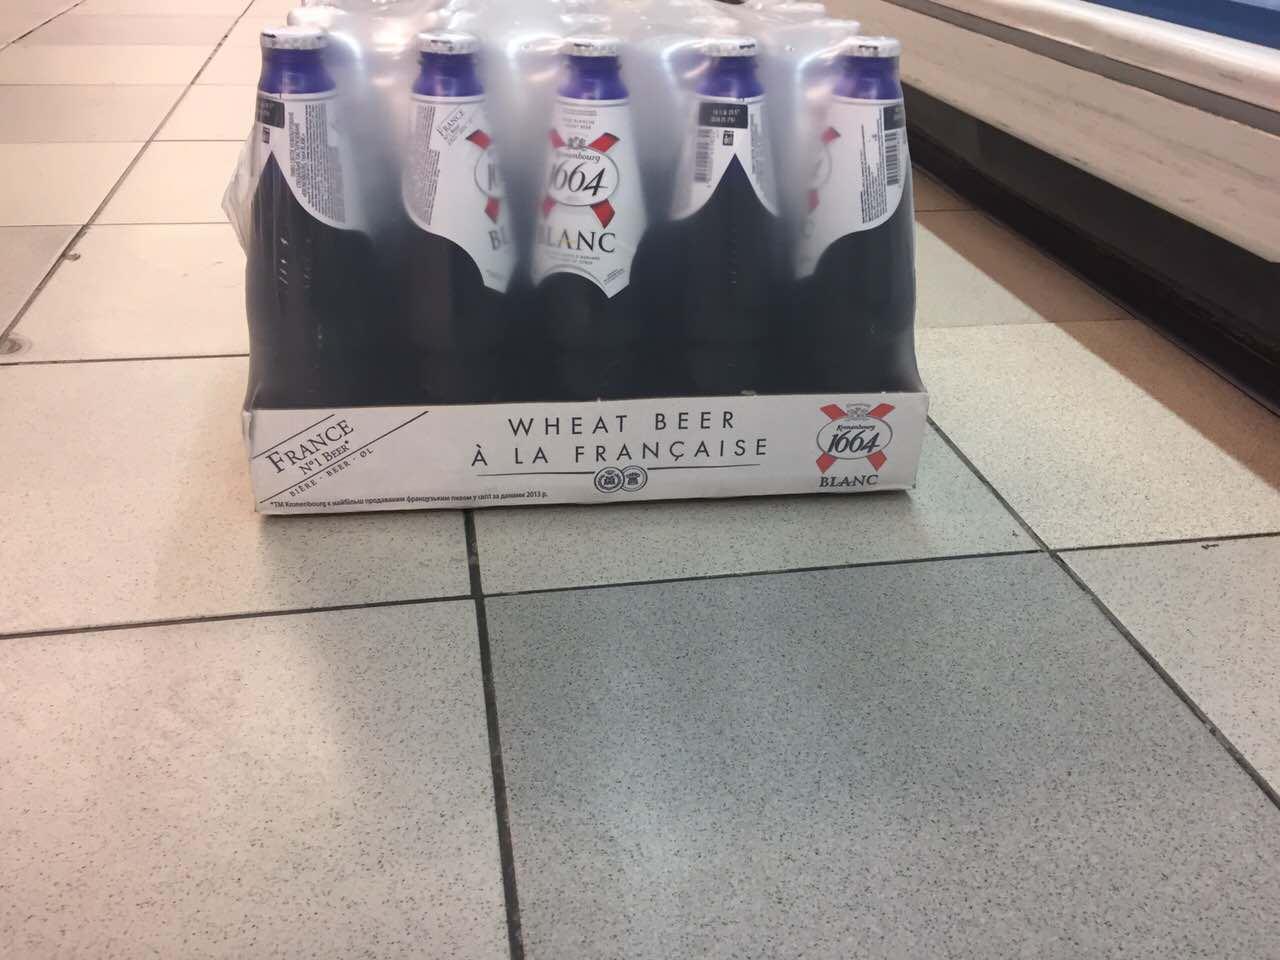 Kronenbourg 1664,Hoegaarden white/blanche beer 24x33cl bottles